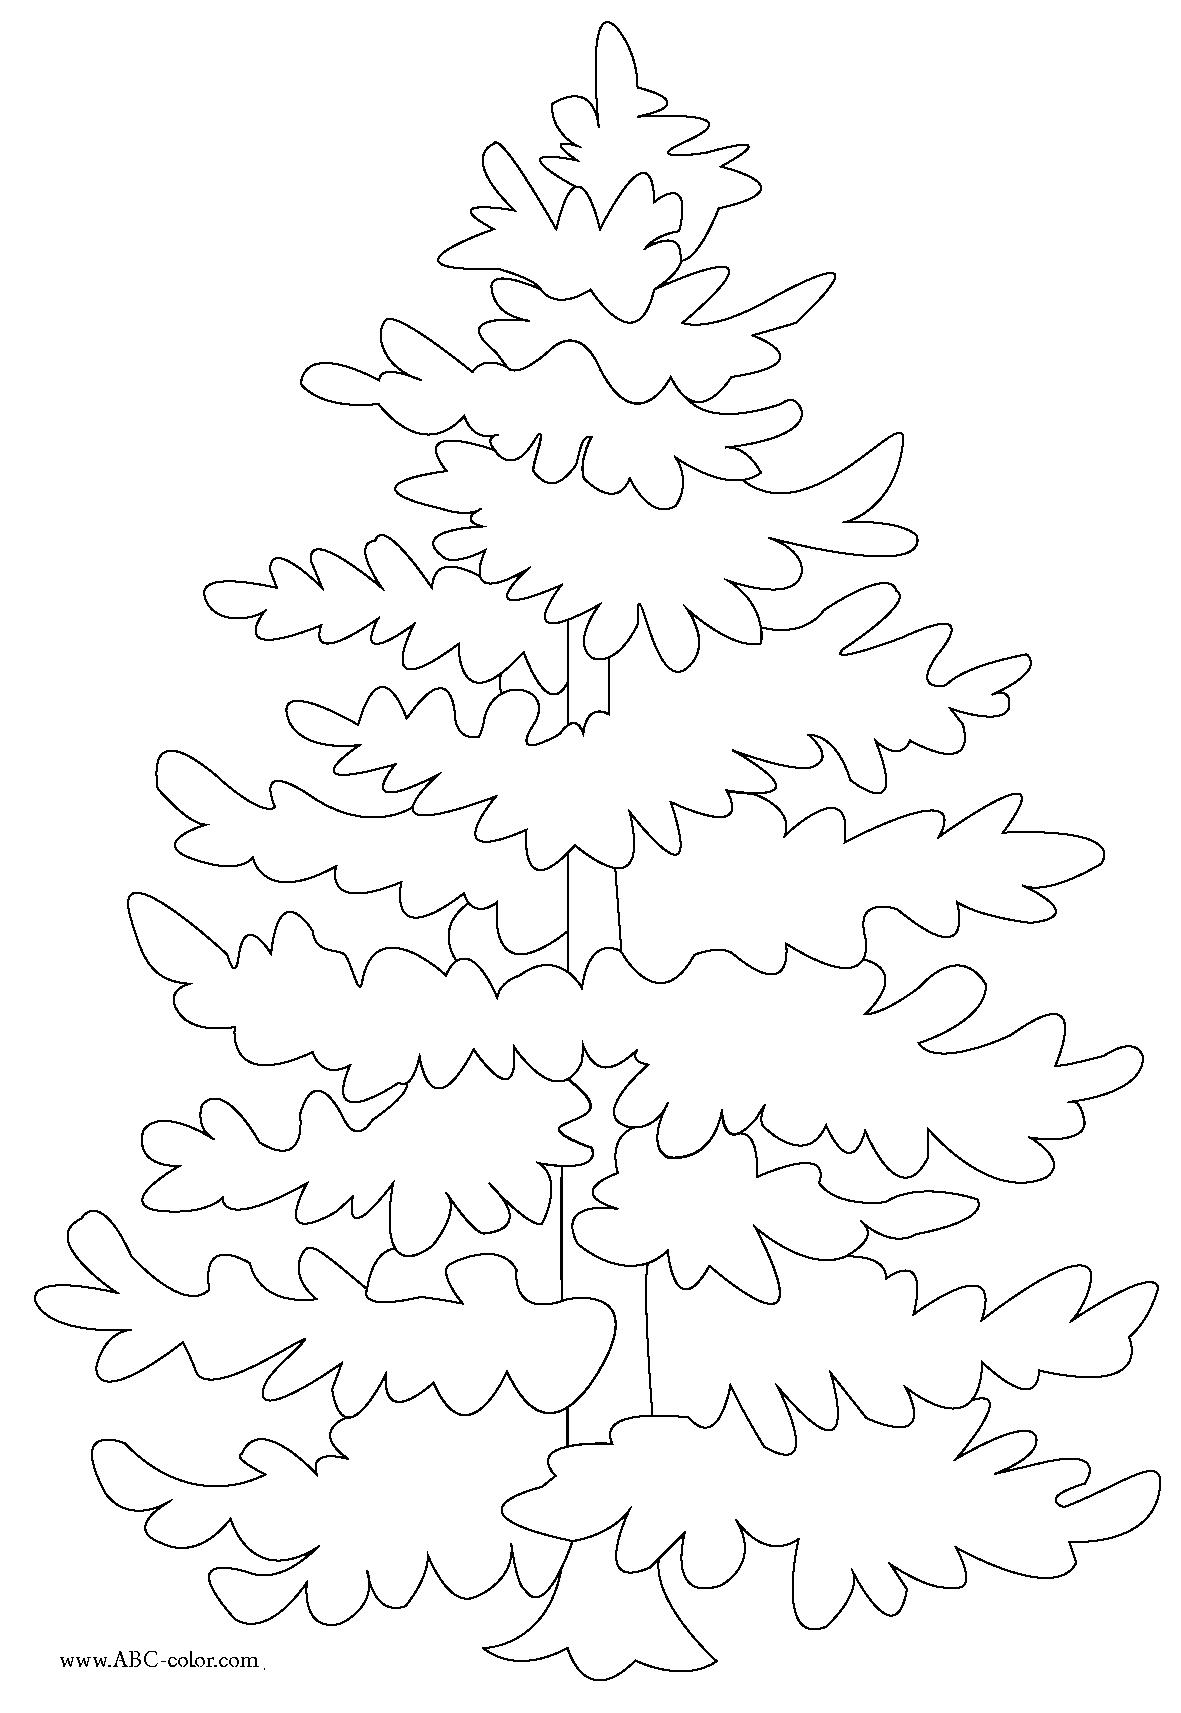 Pine Tree Coloring Page Christmas Tree Coloring Page Christmas Coloring Pages Tree Coloring Page